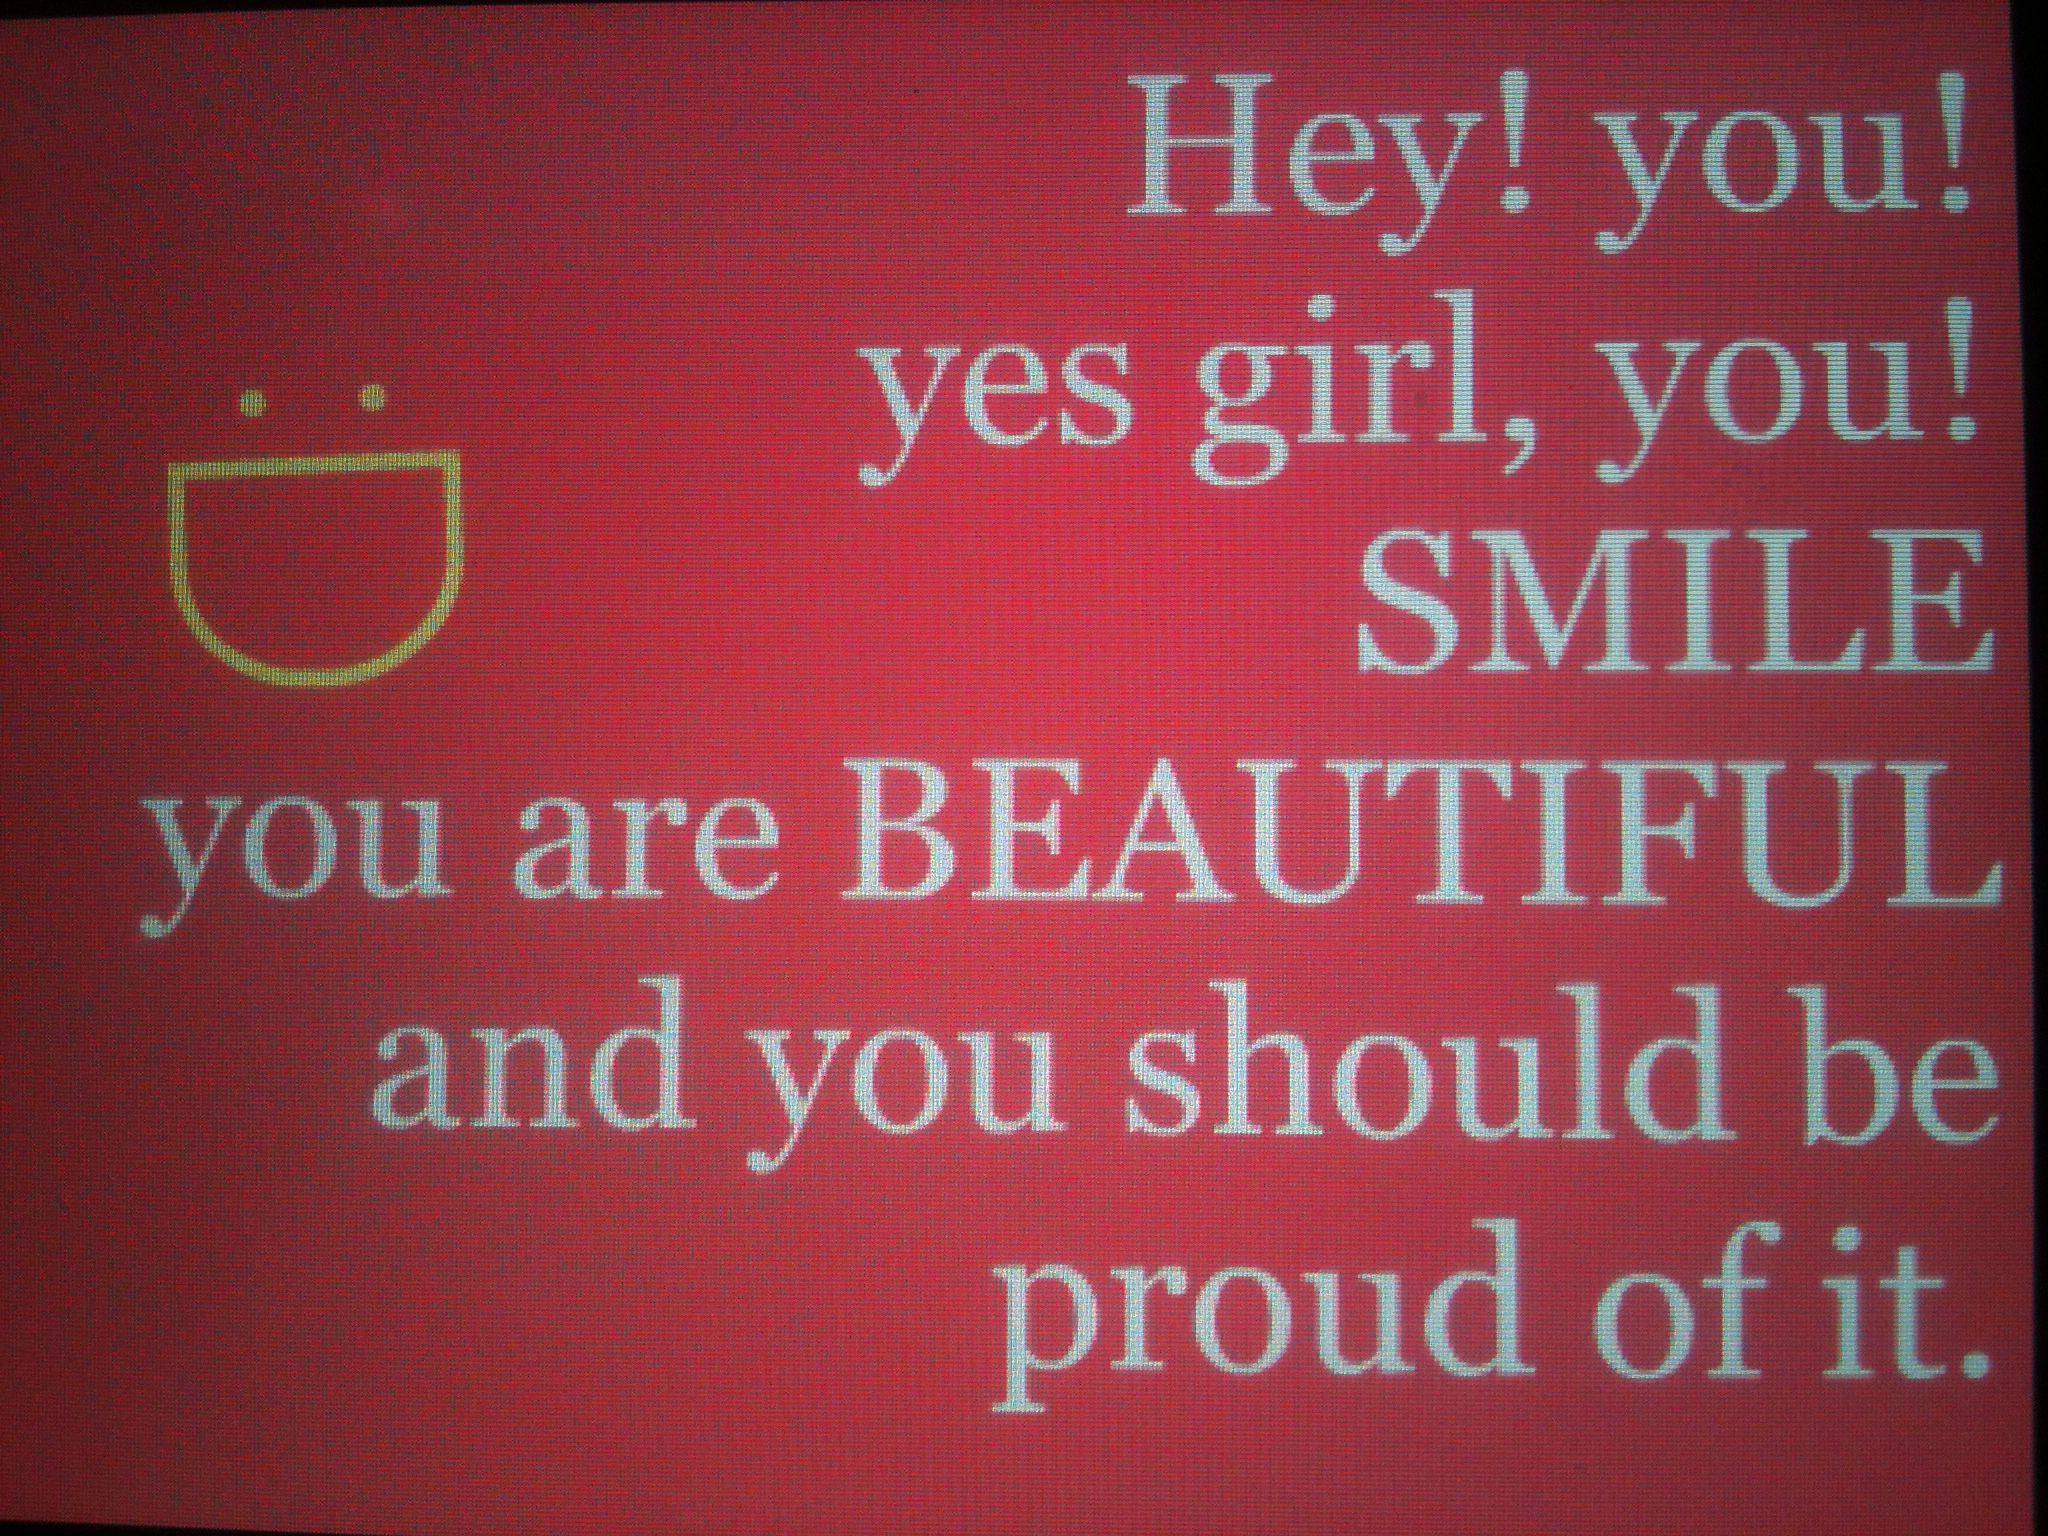 Smile beautiful!